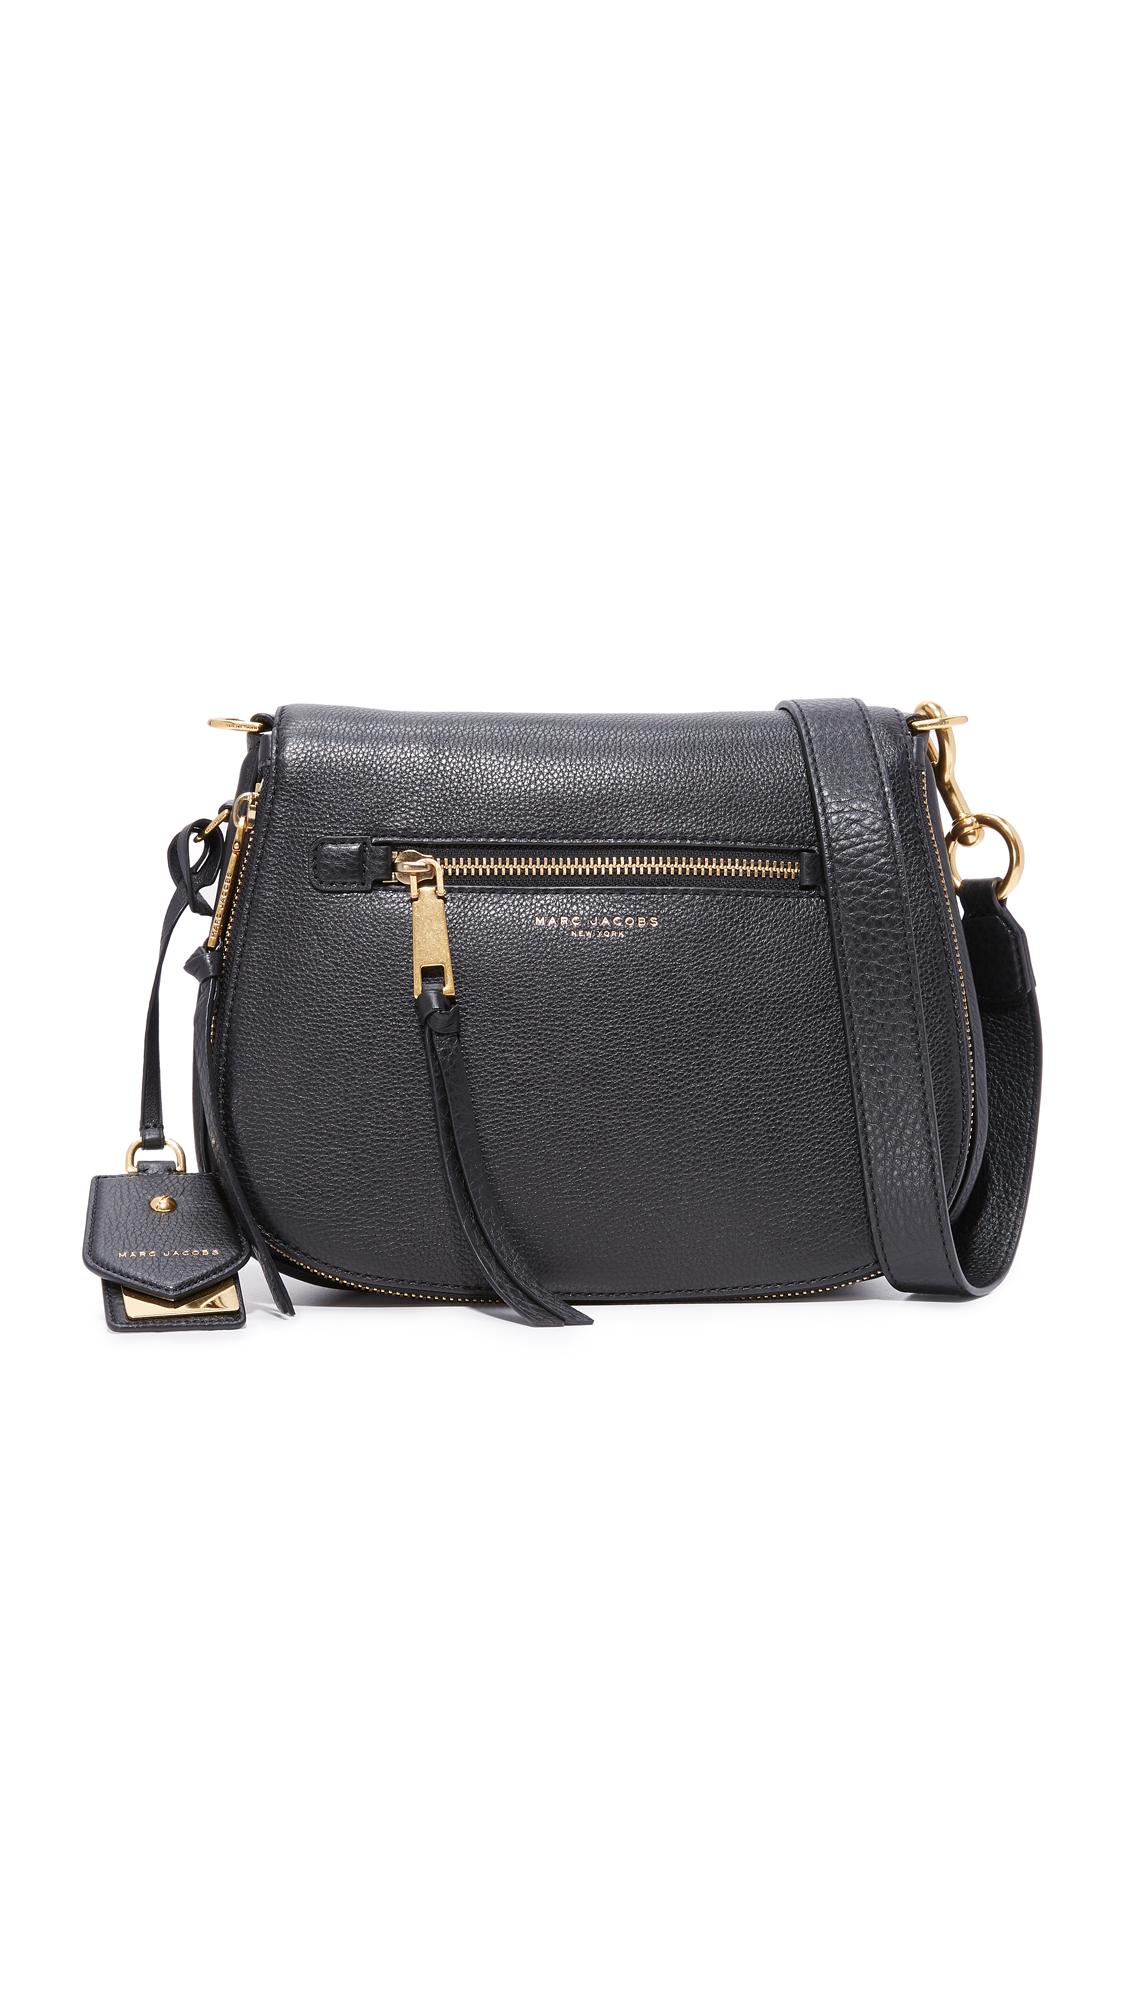 Marc Jacobs Recruit Saddle Bag - Black